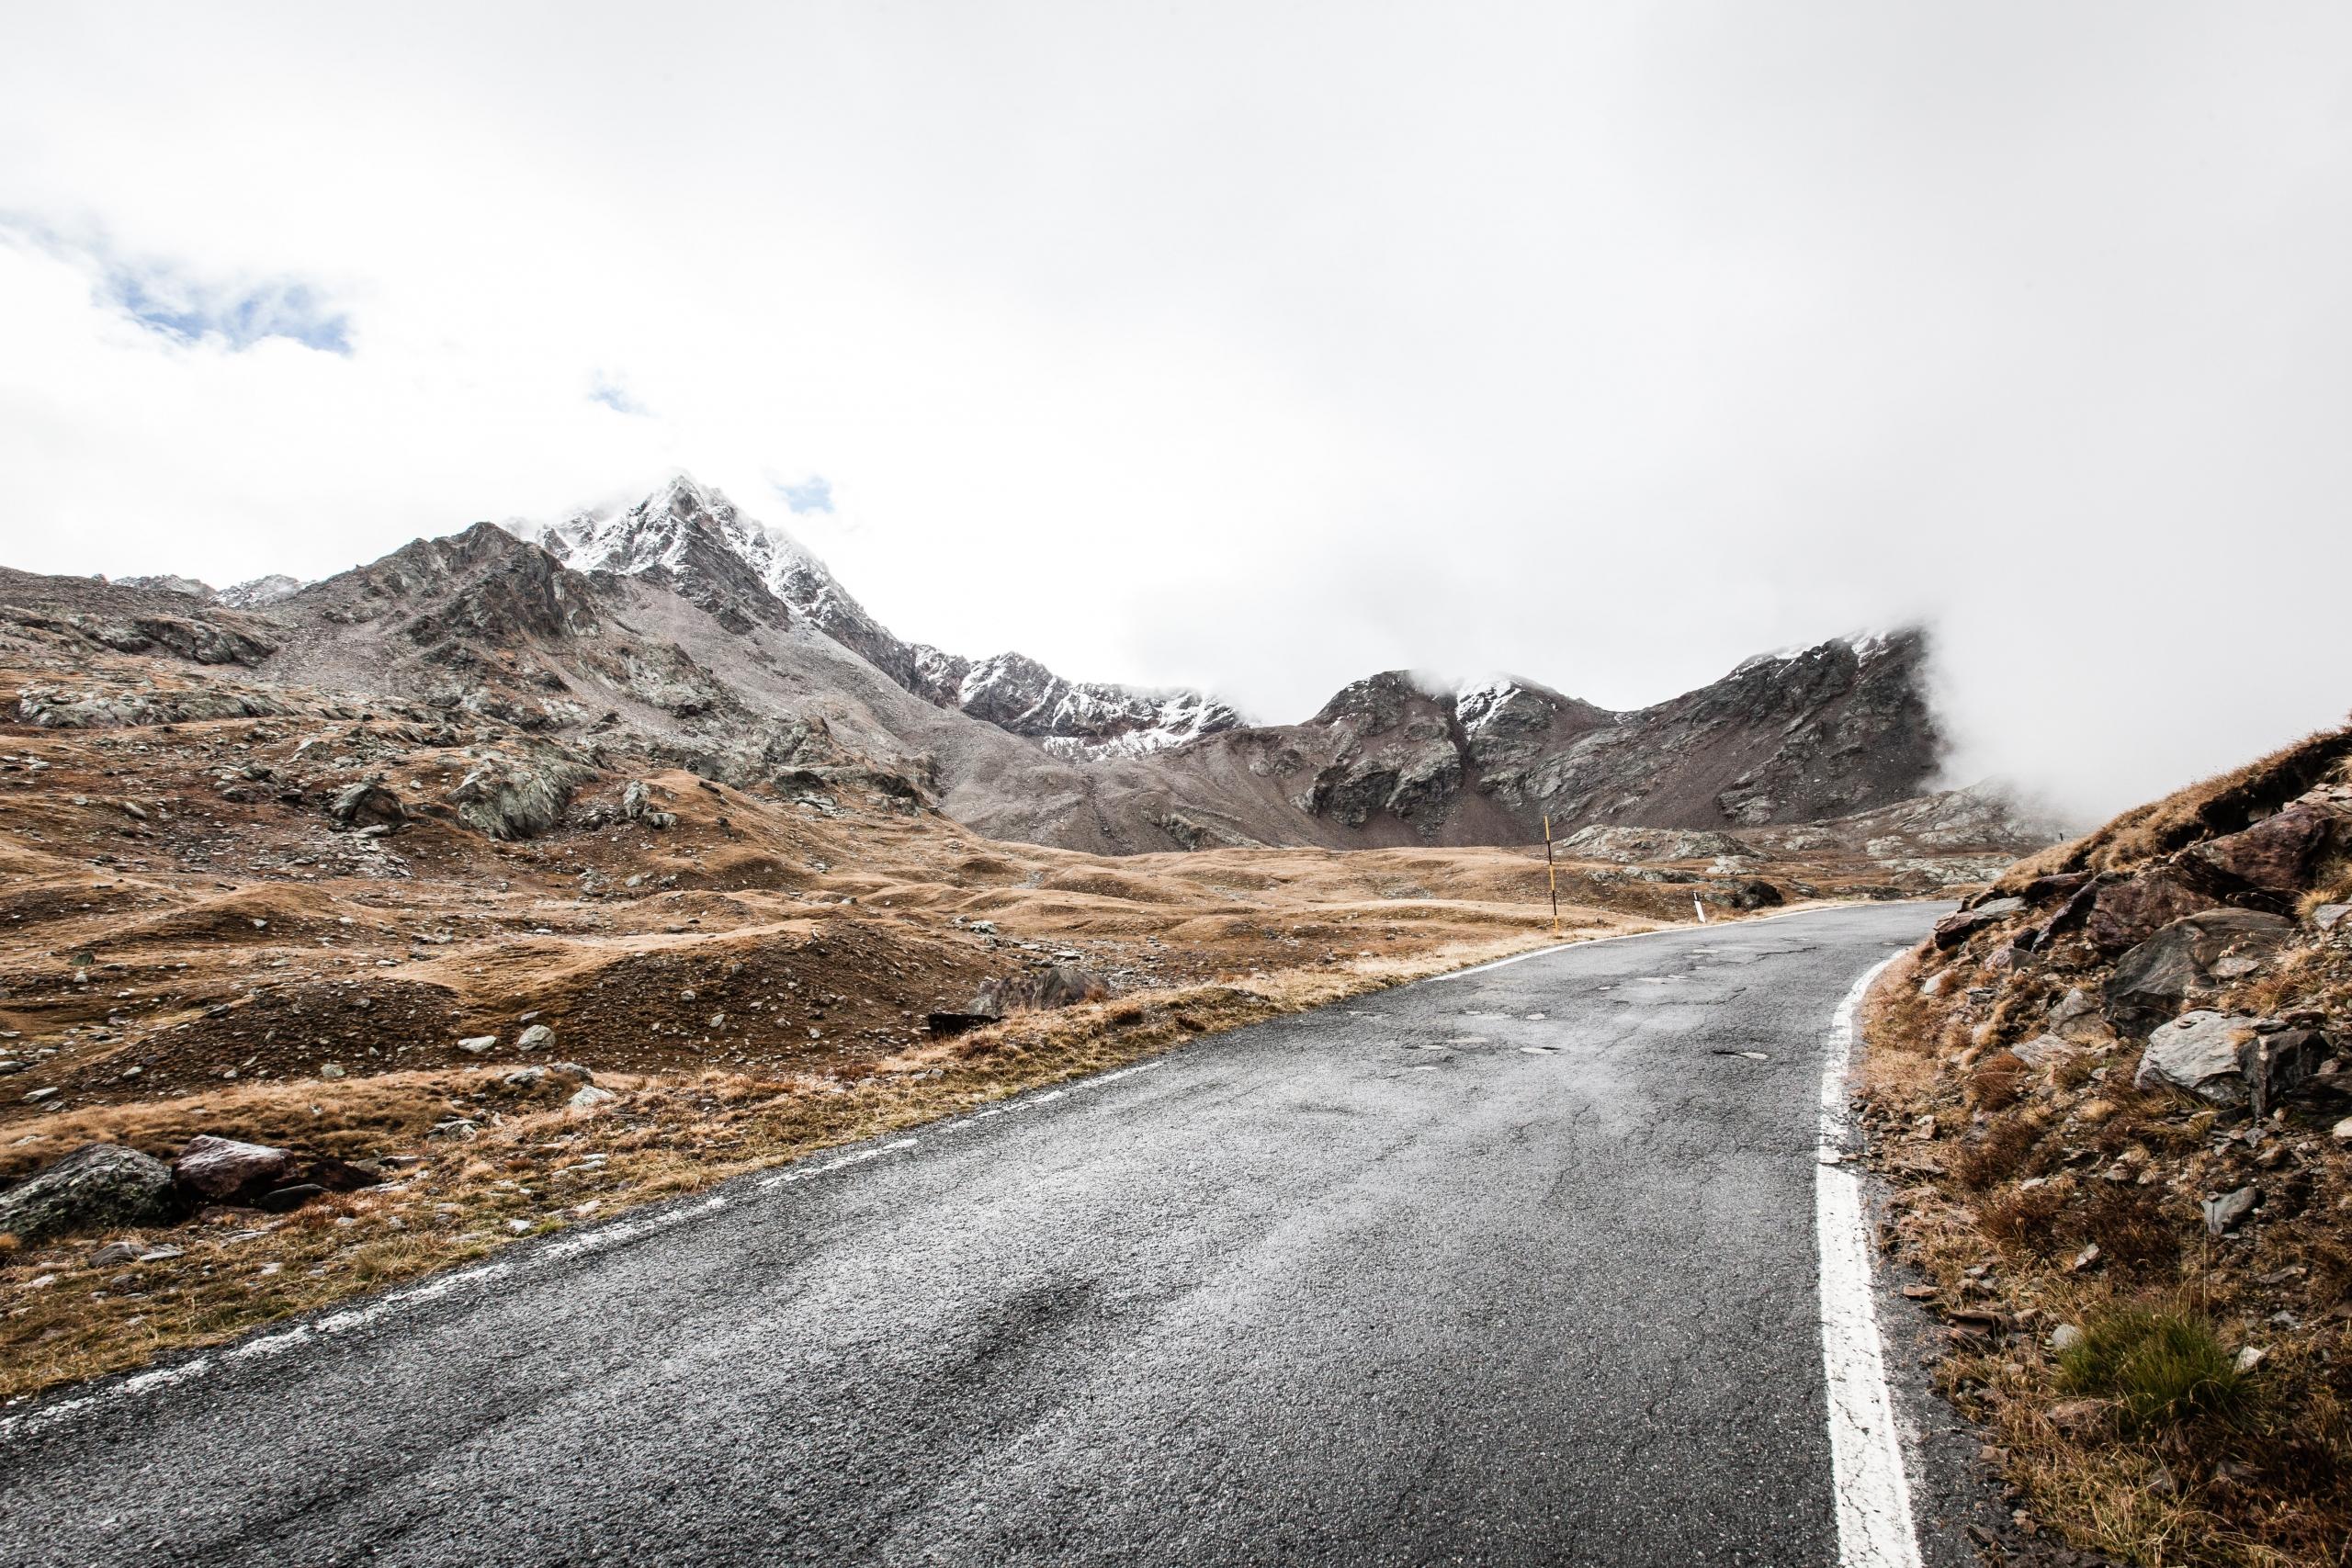 Garcia Pass Cycling Route